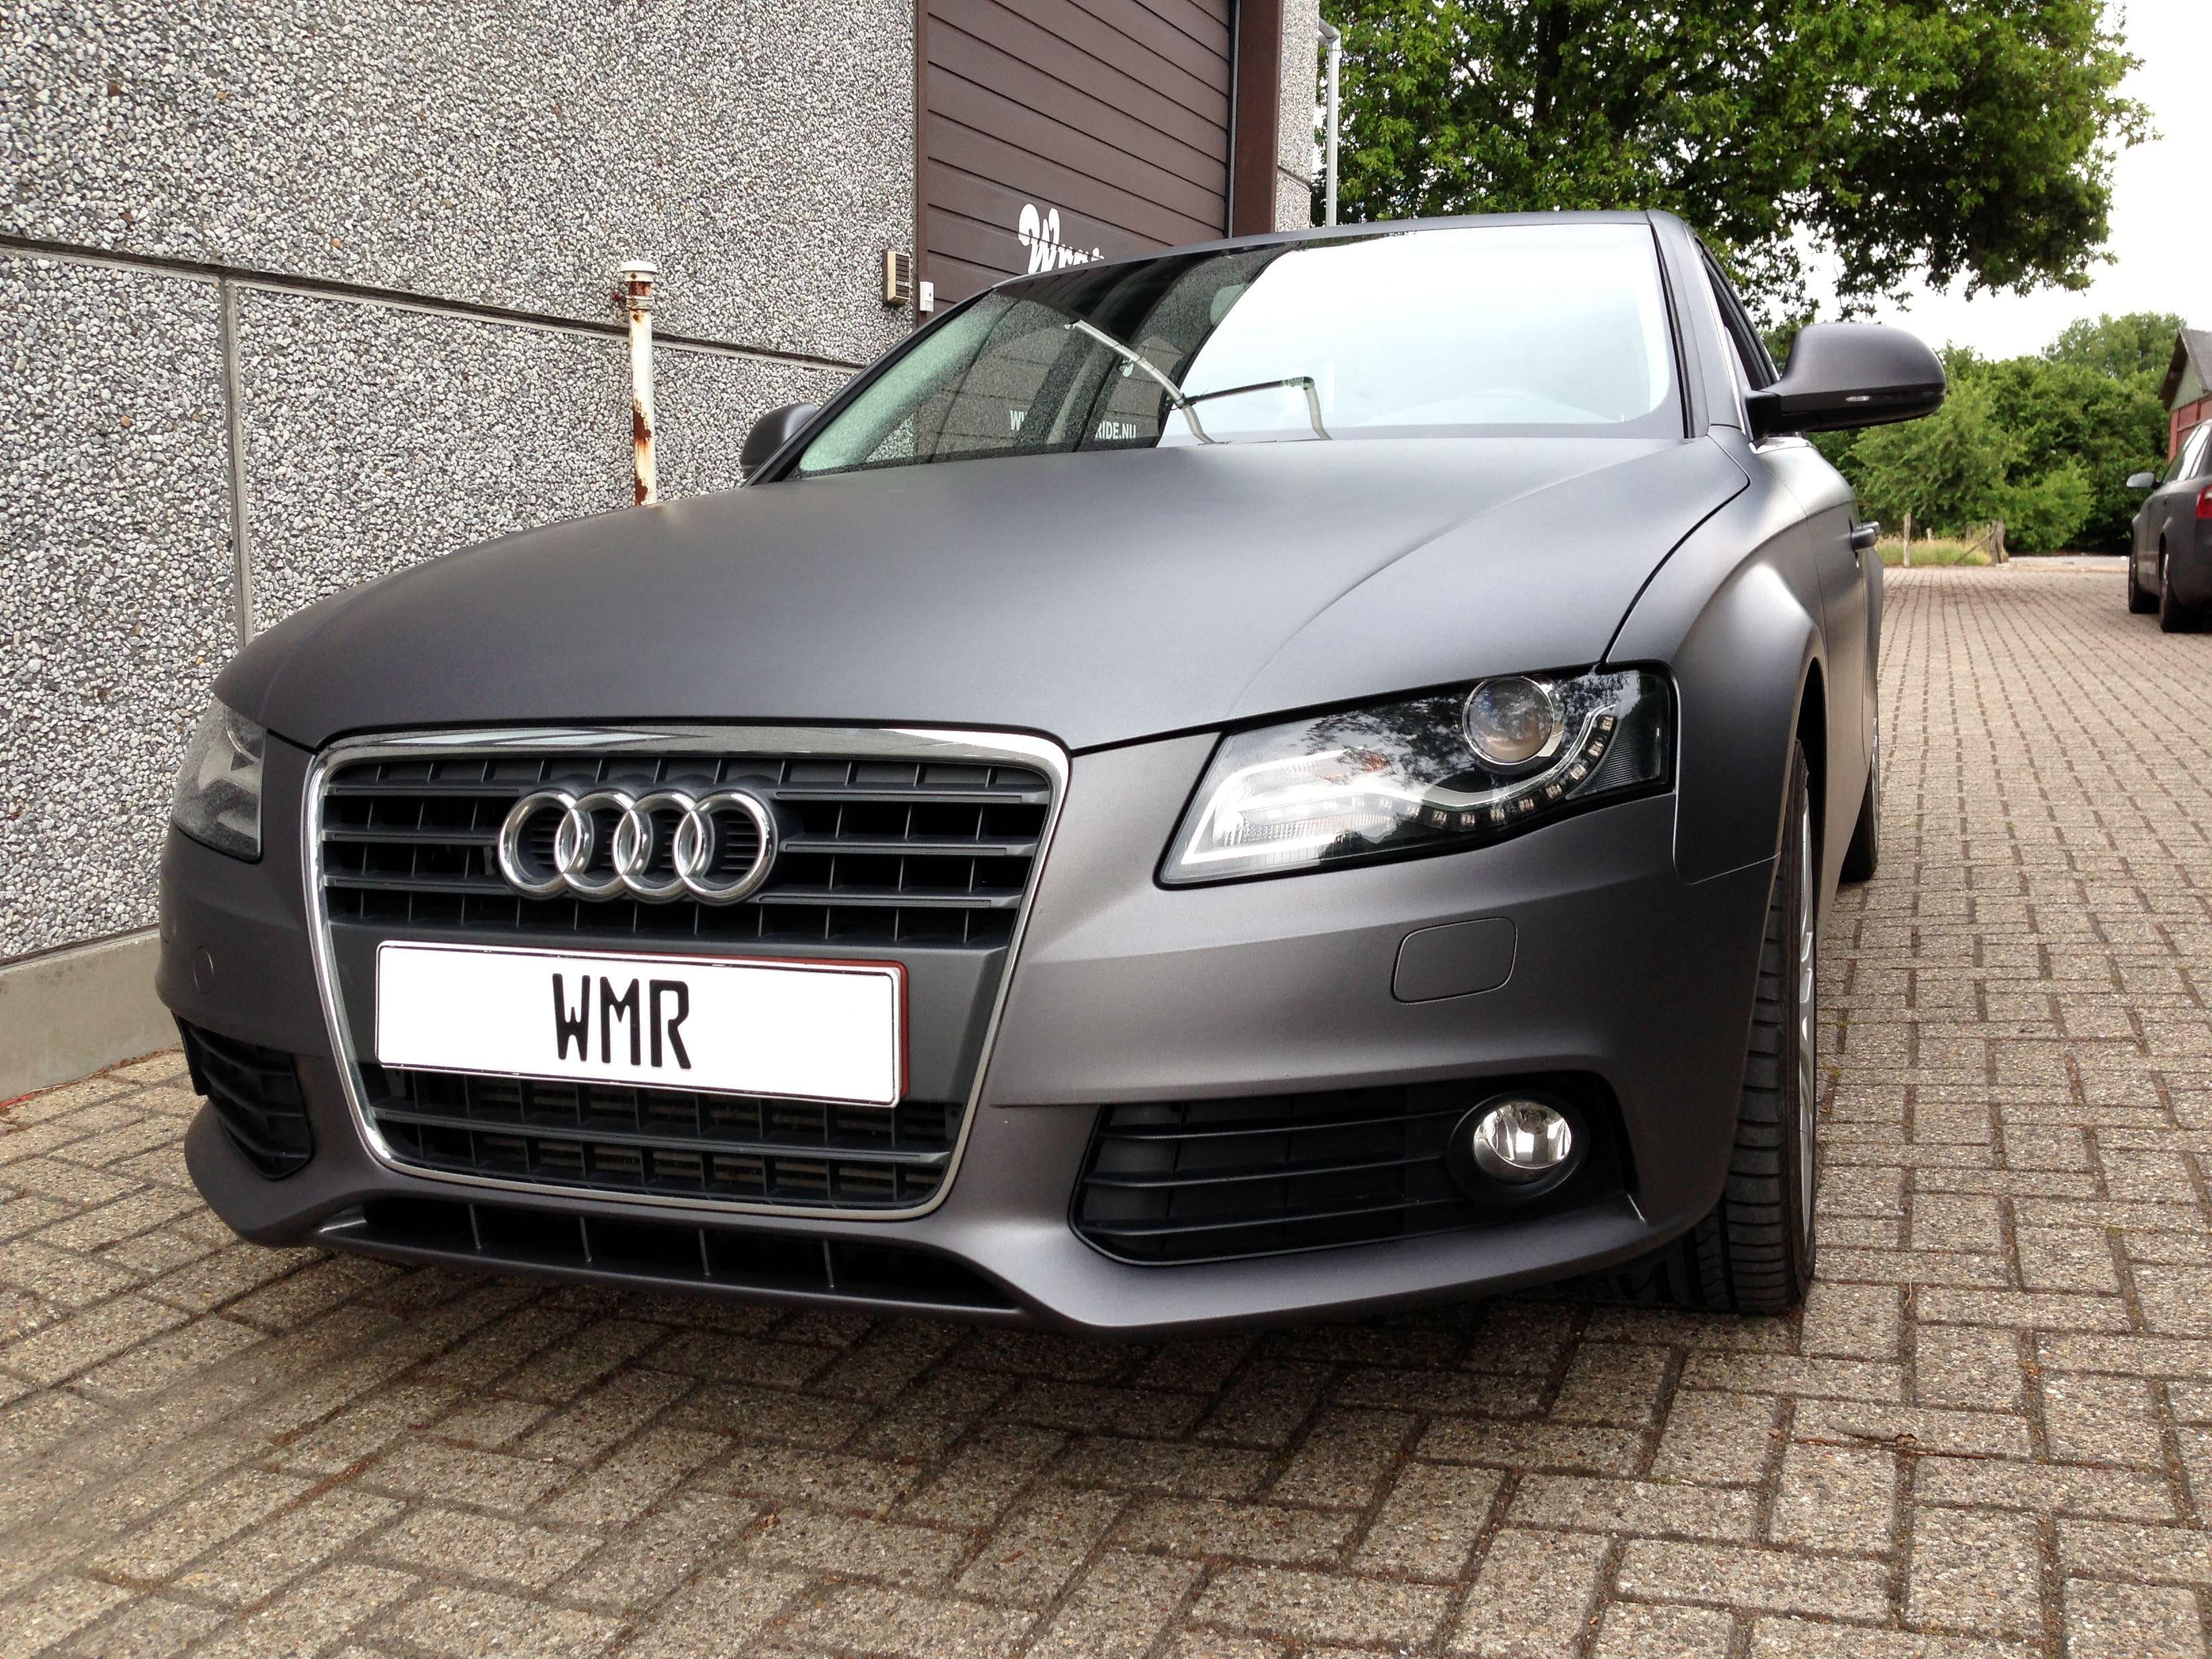 Audi A4 B6 met Gunpowder Wrap, Carwrapping door Wrapmyride.nu Foto-nr:4509, ©2021